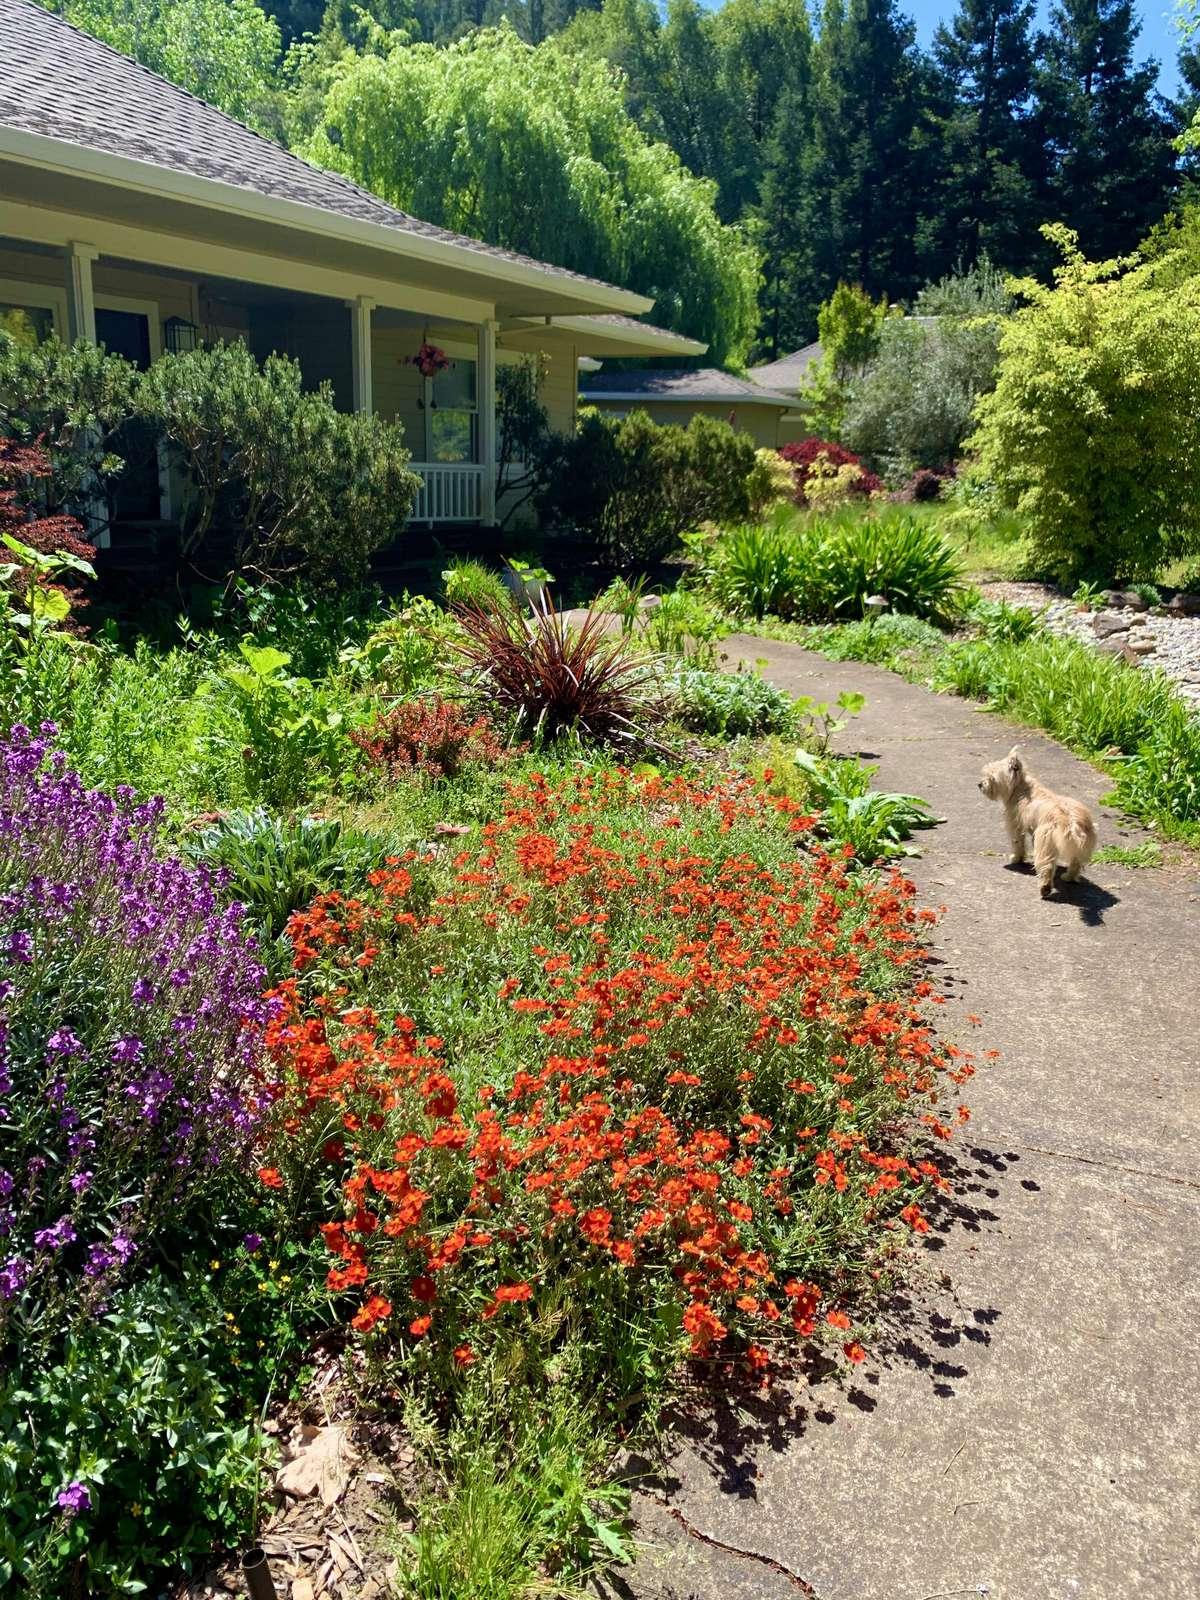 Lovely gardens & pet friendly